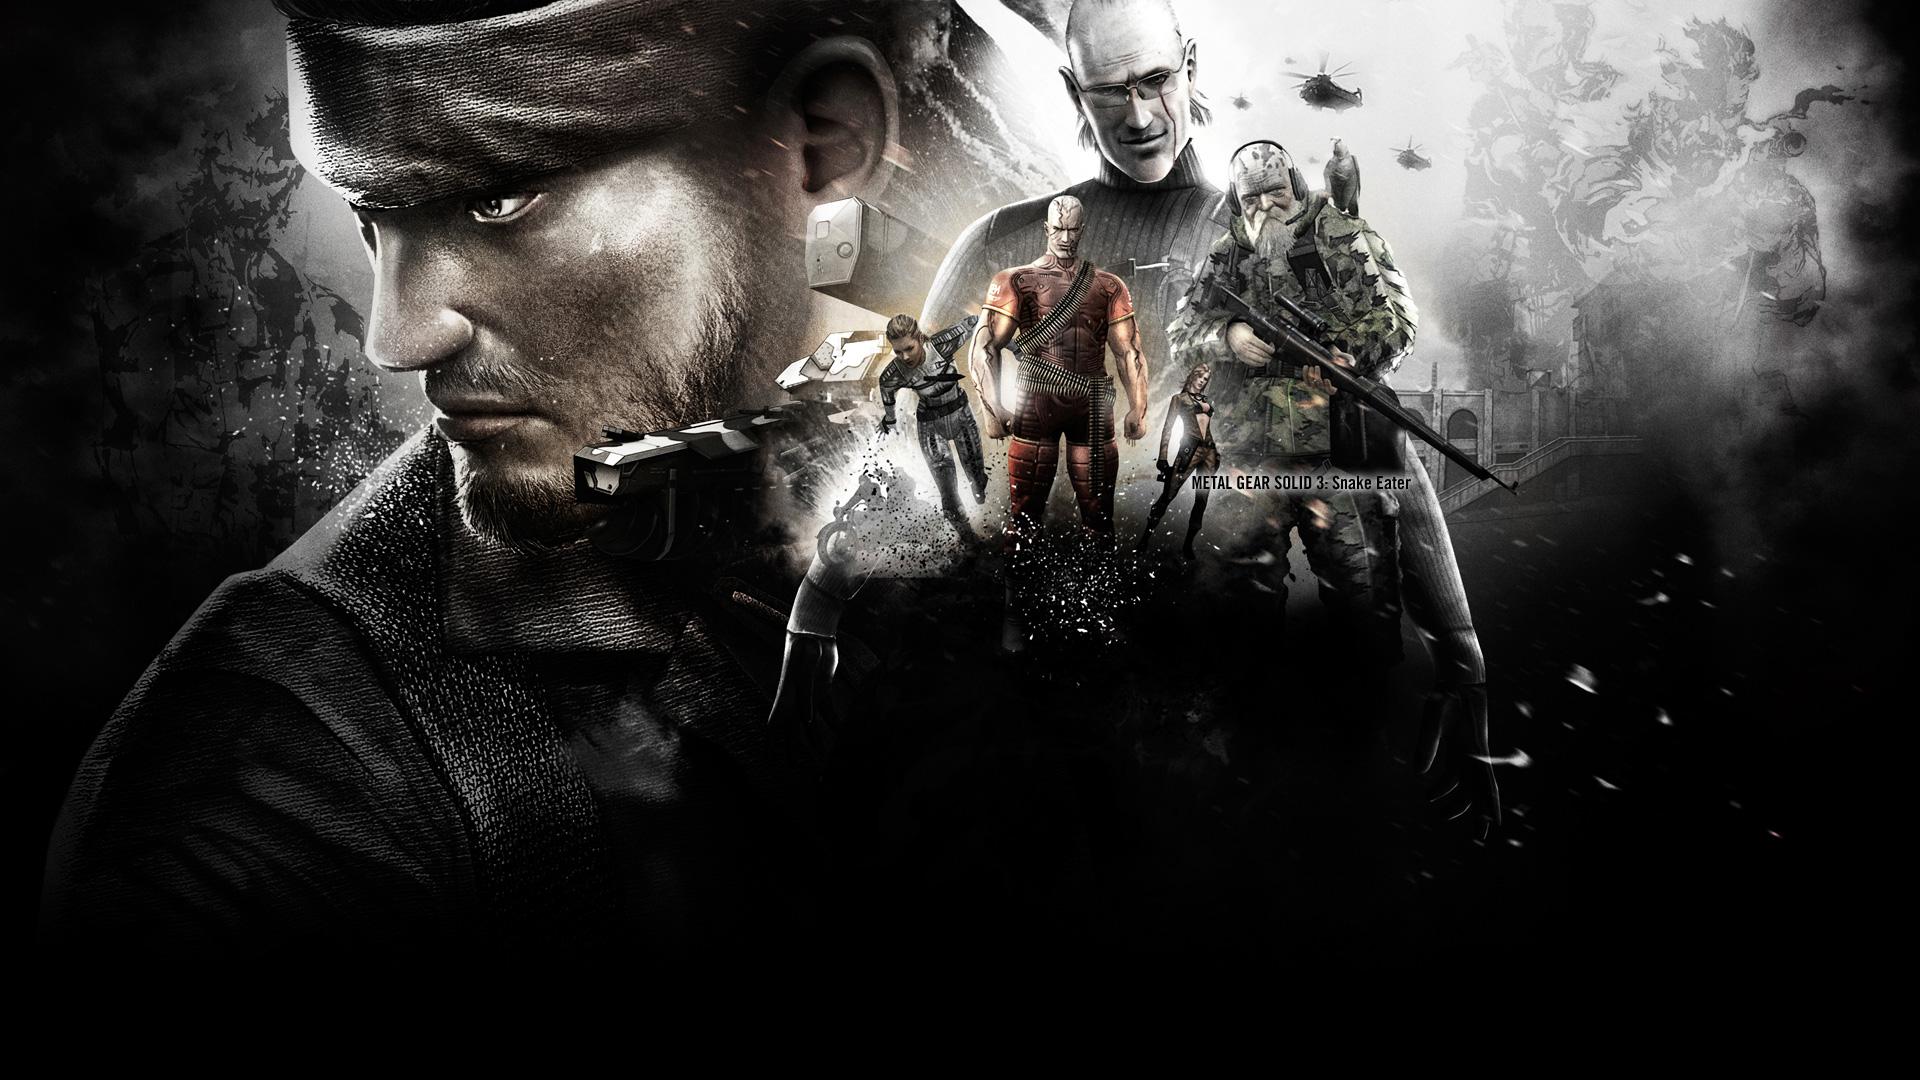 Free Download Metal Gear Wallpaper 1920x1080 Metal Gear Solid Big